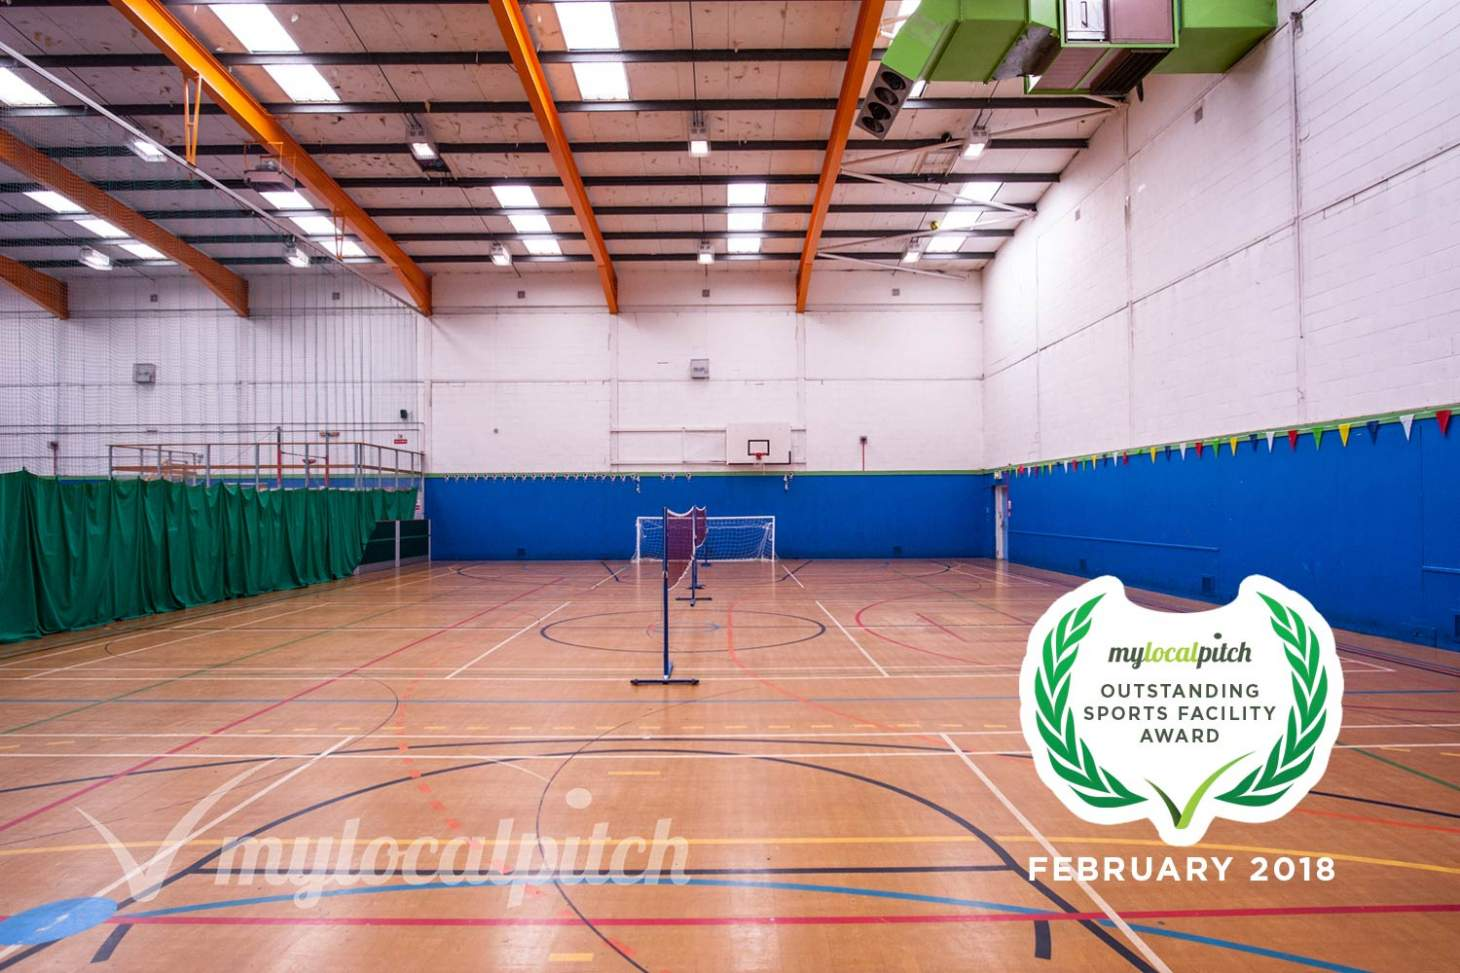 Ordsall Leisure Centre Indoor netball court